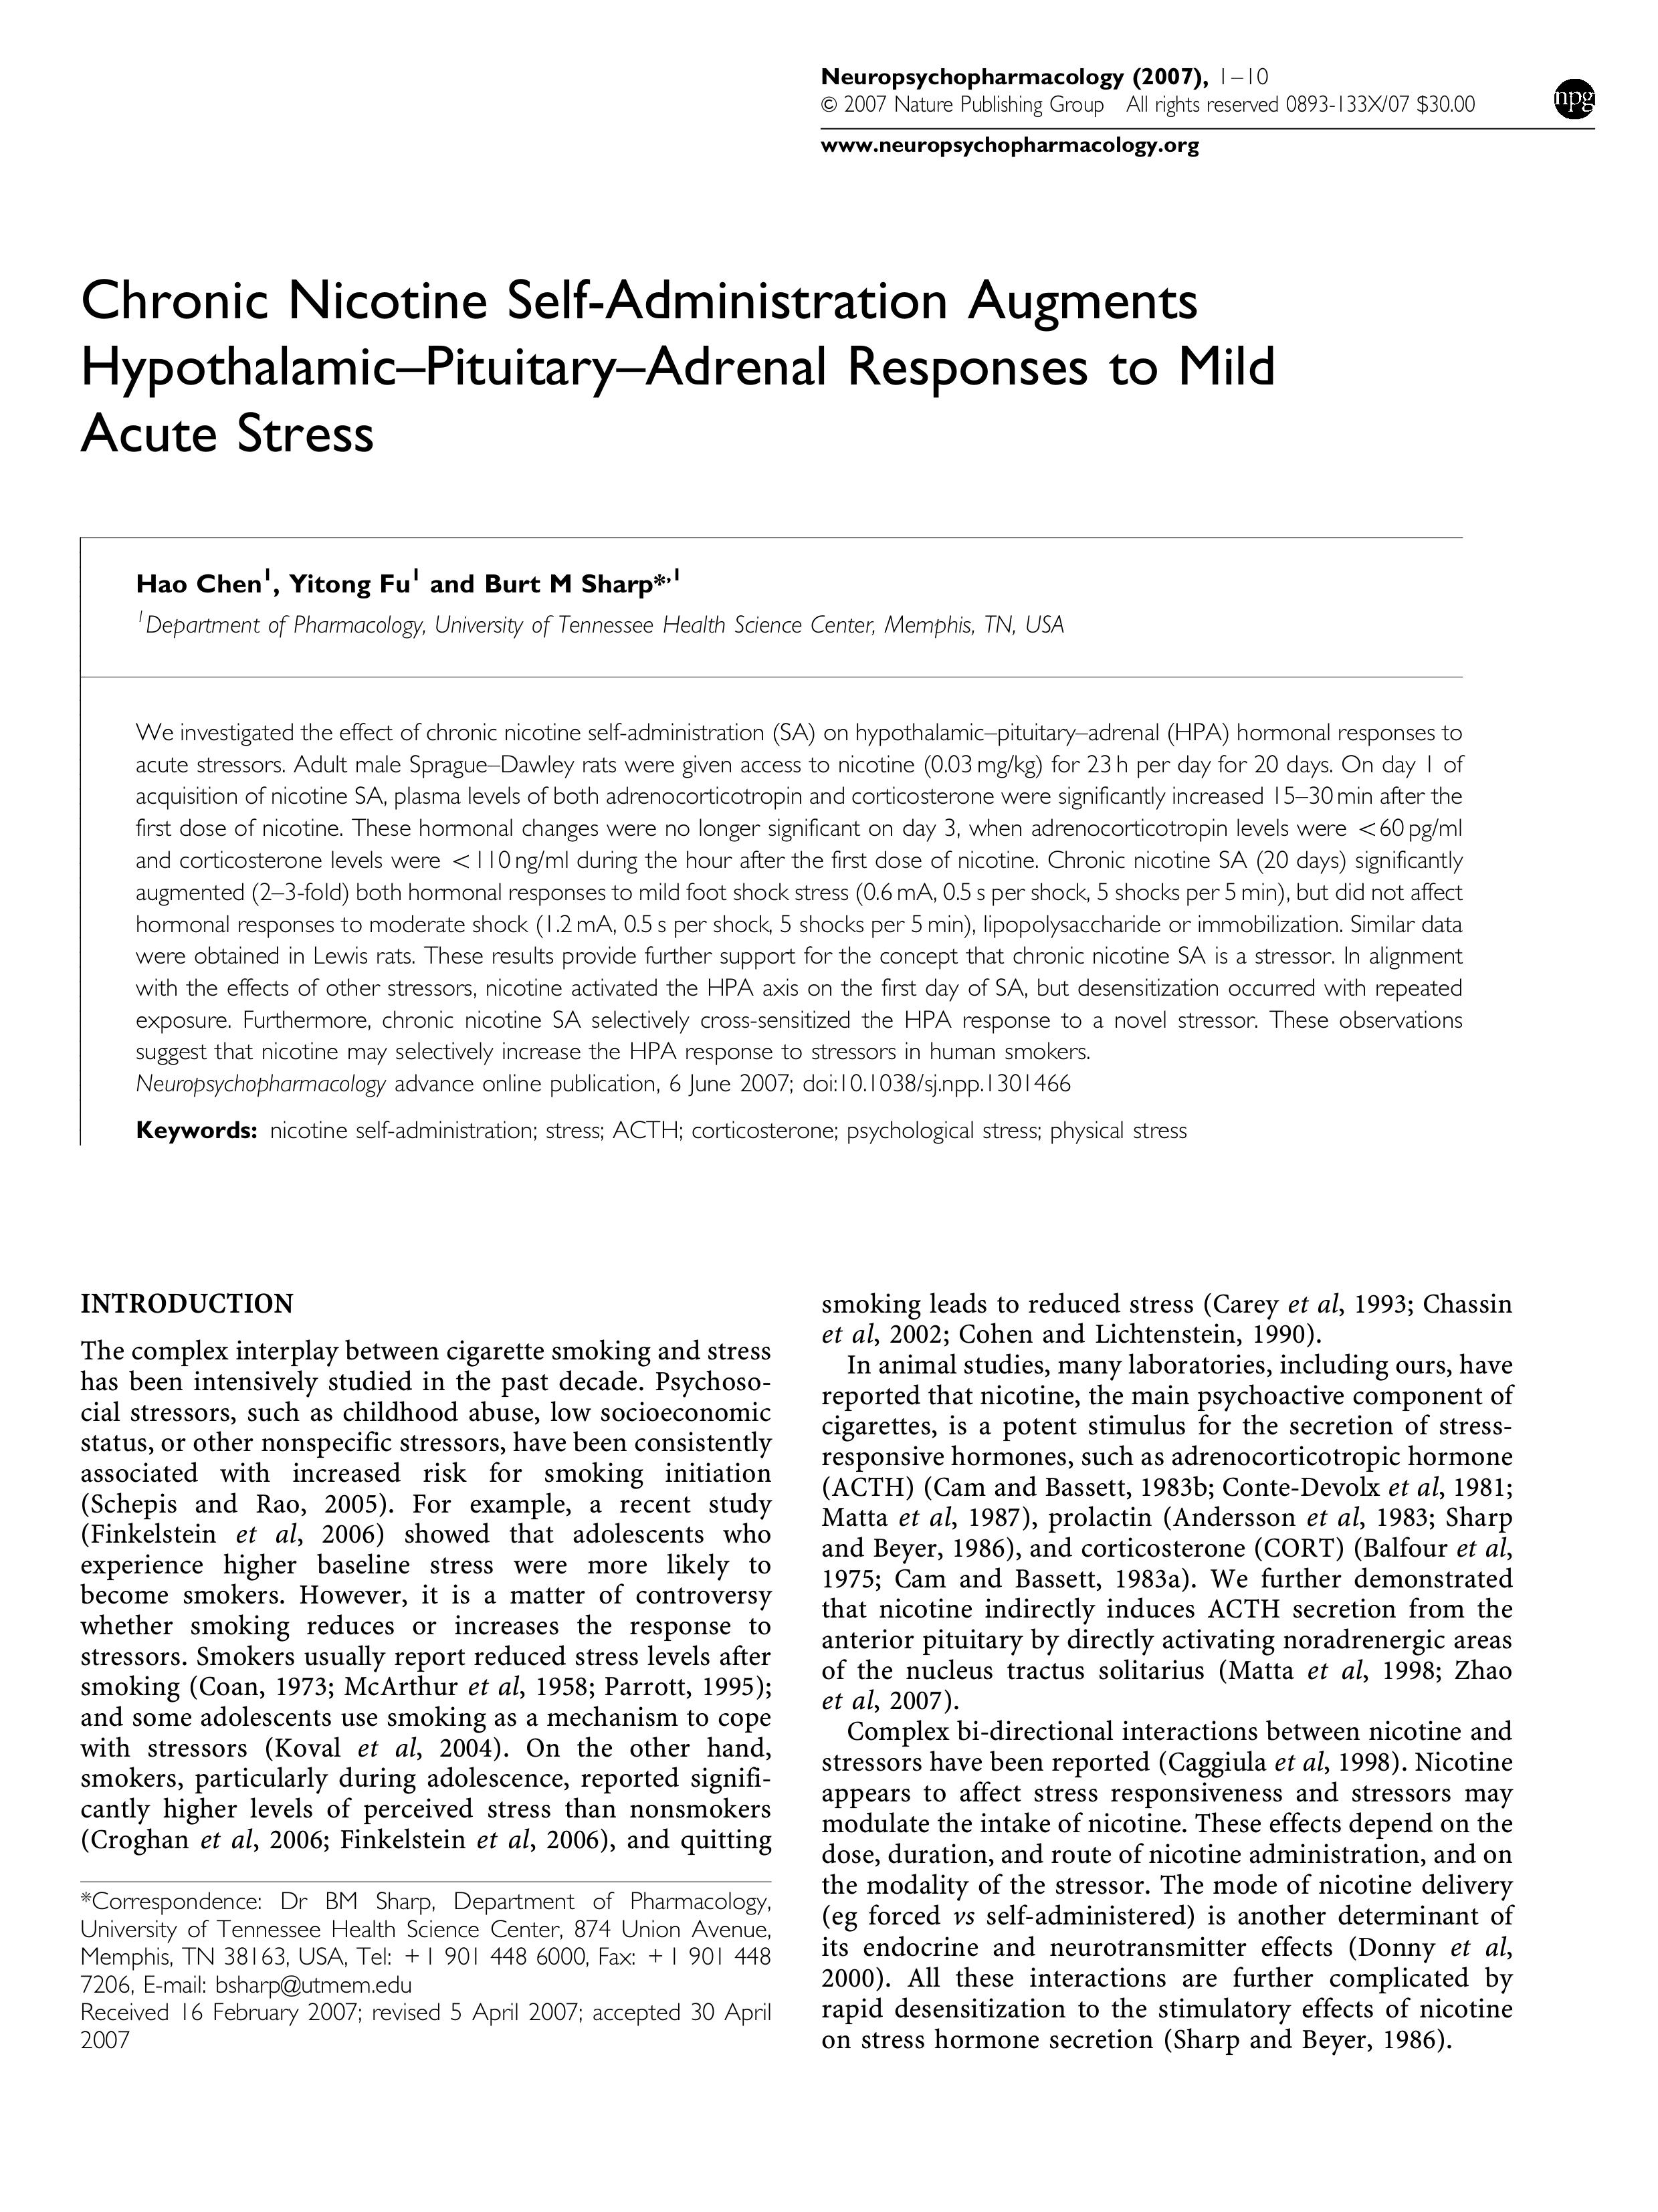 Chen, Fu, Sharp - 2008 - Neuropsychopharmacology.png